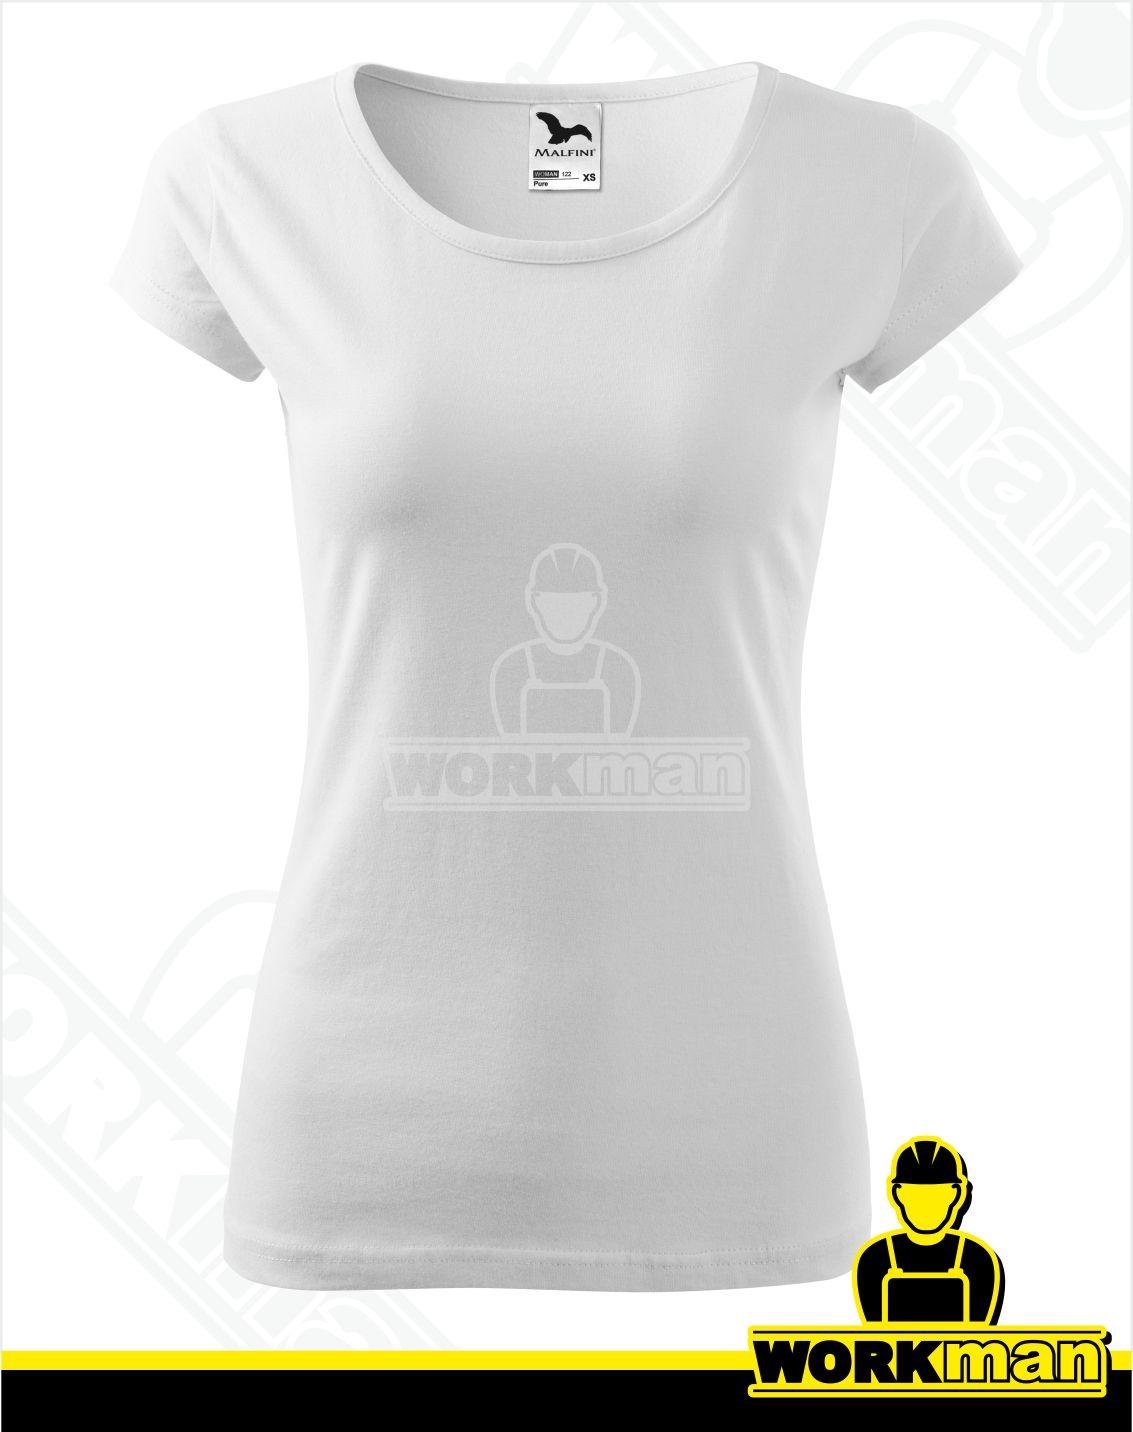 ebf93b1e27ef Dámske tričko PURE Malfini biela Pracovné odevy Workman